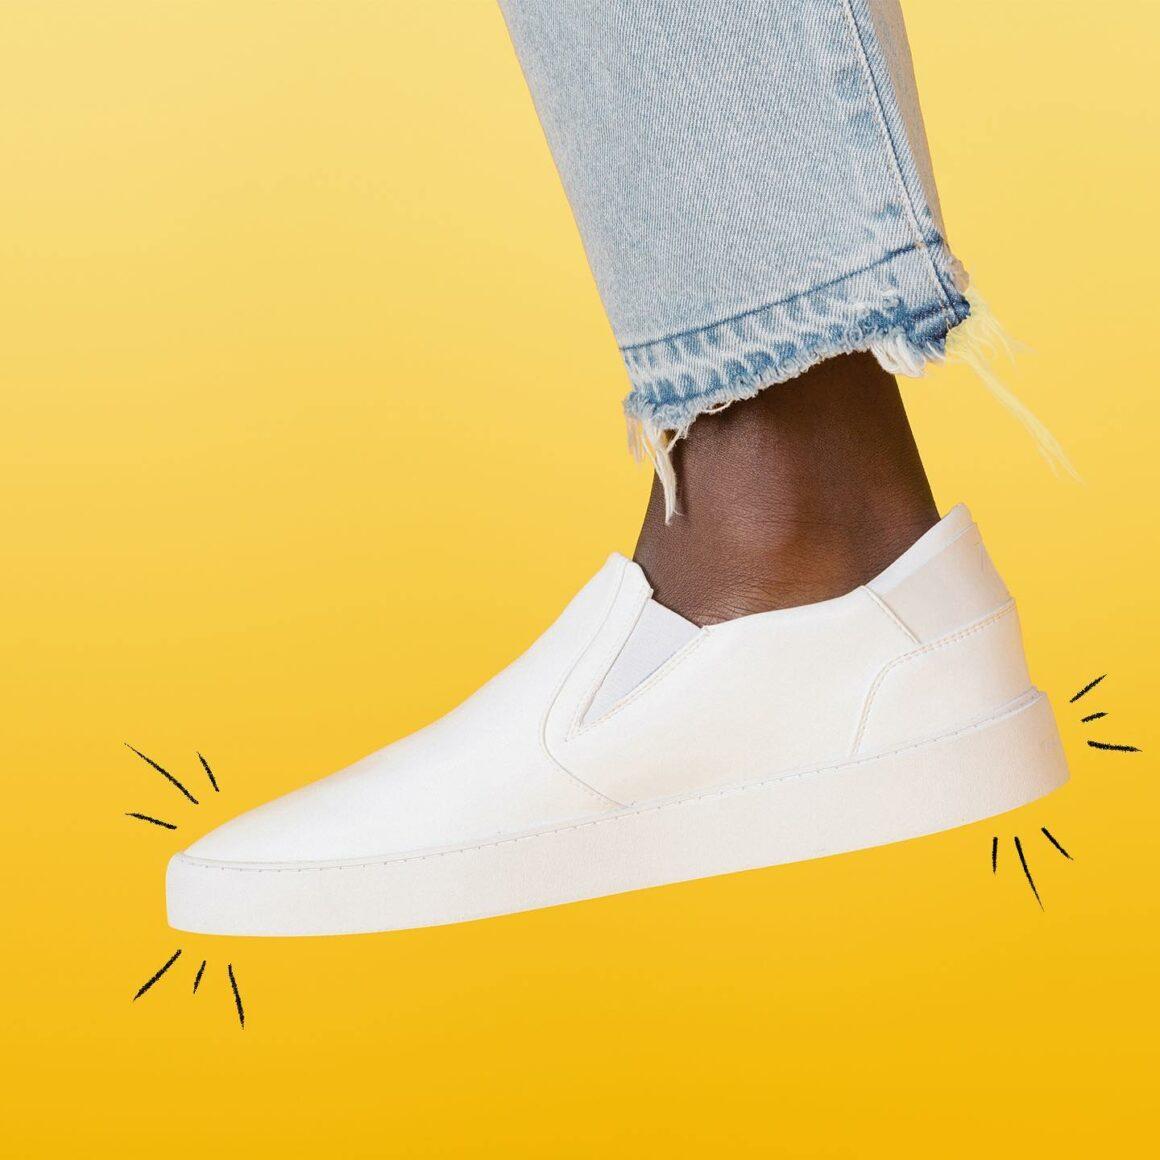 Vegan & Sustainable Shoe Brands - Thousand Fell